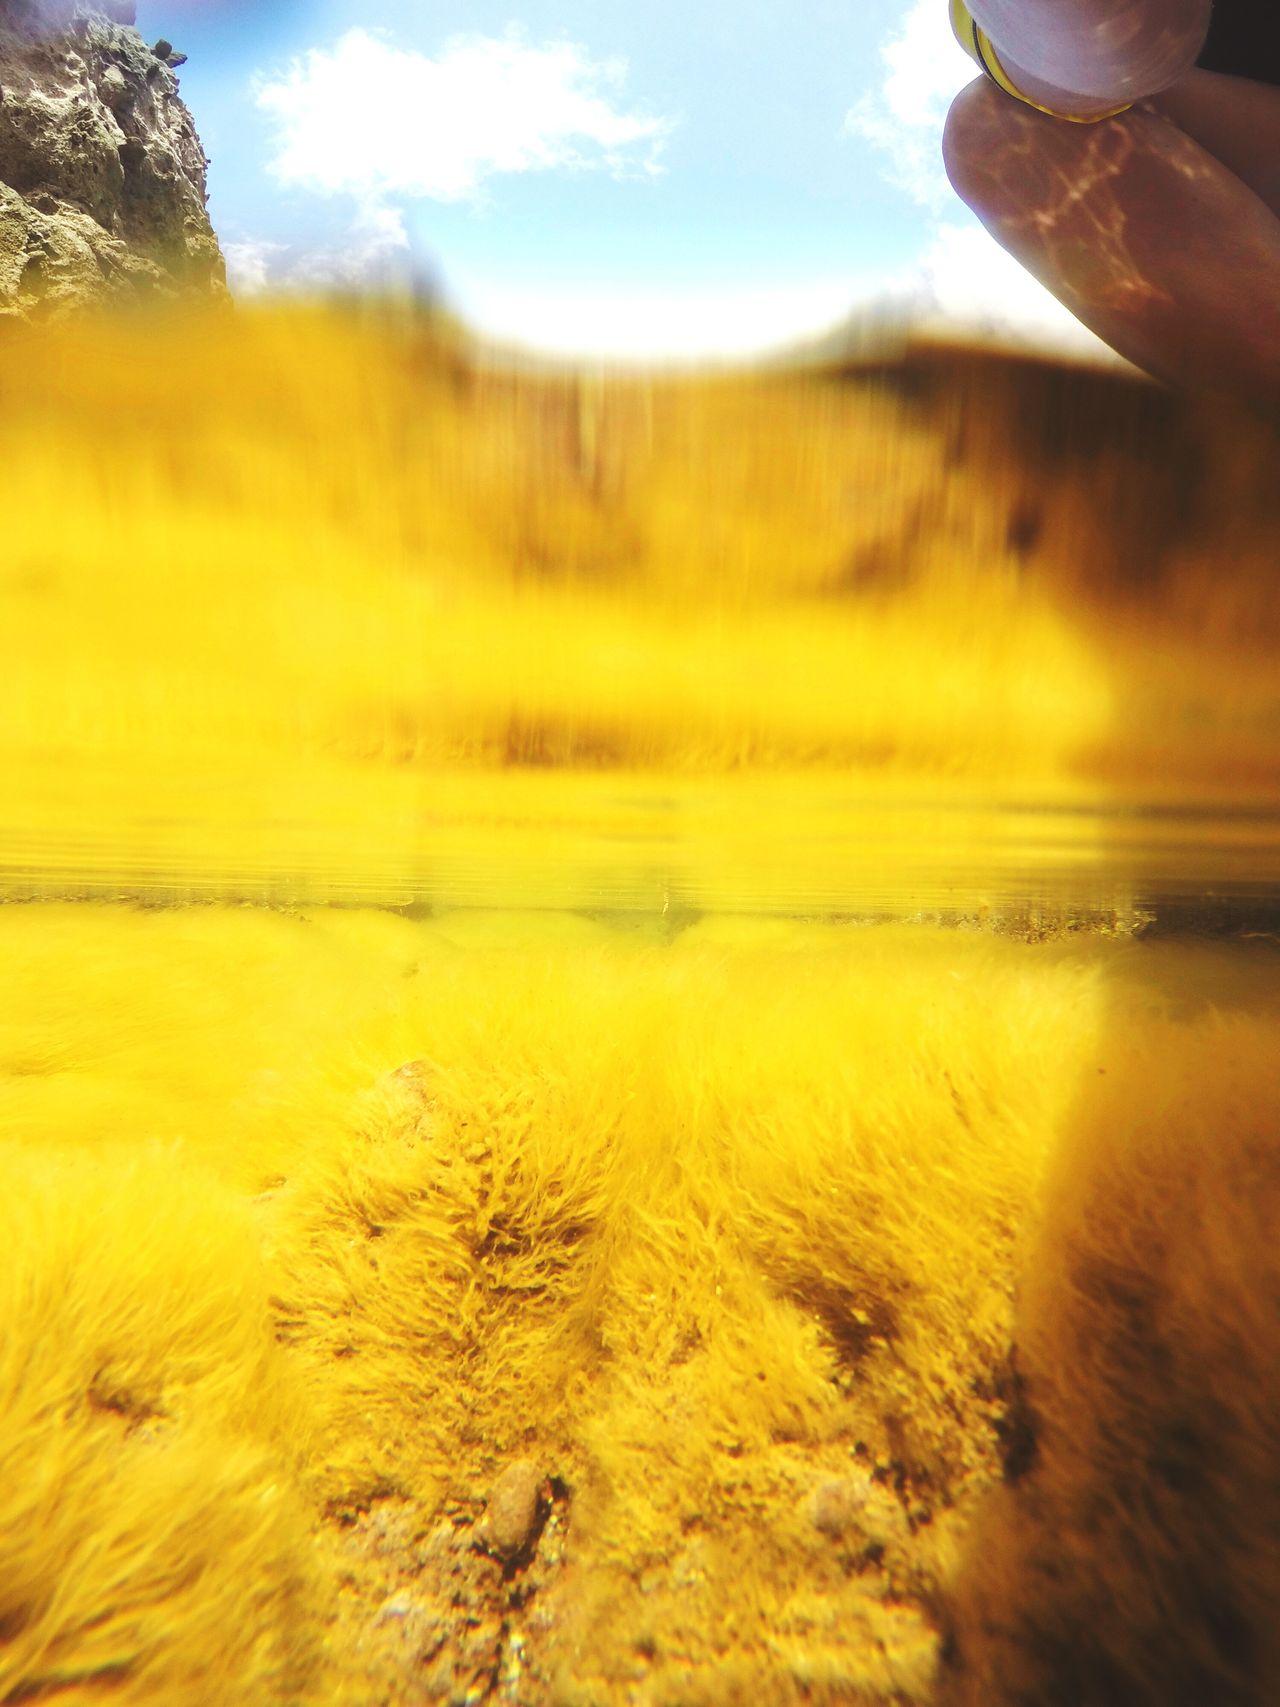 Tidepools in Saba Tidepool Sea Life Nature Water Underwater Beauty In Nature Close-up UnderSea Outdoors EyeEmNewHere EyeEmNewHere